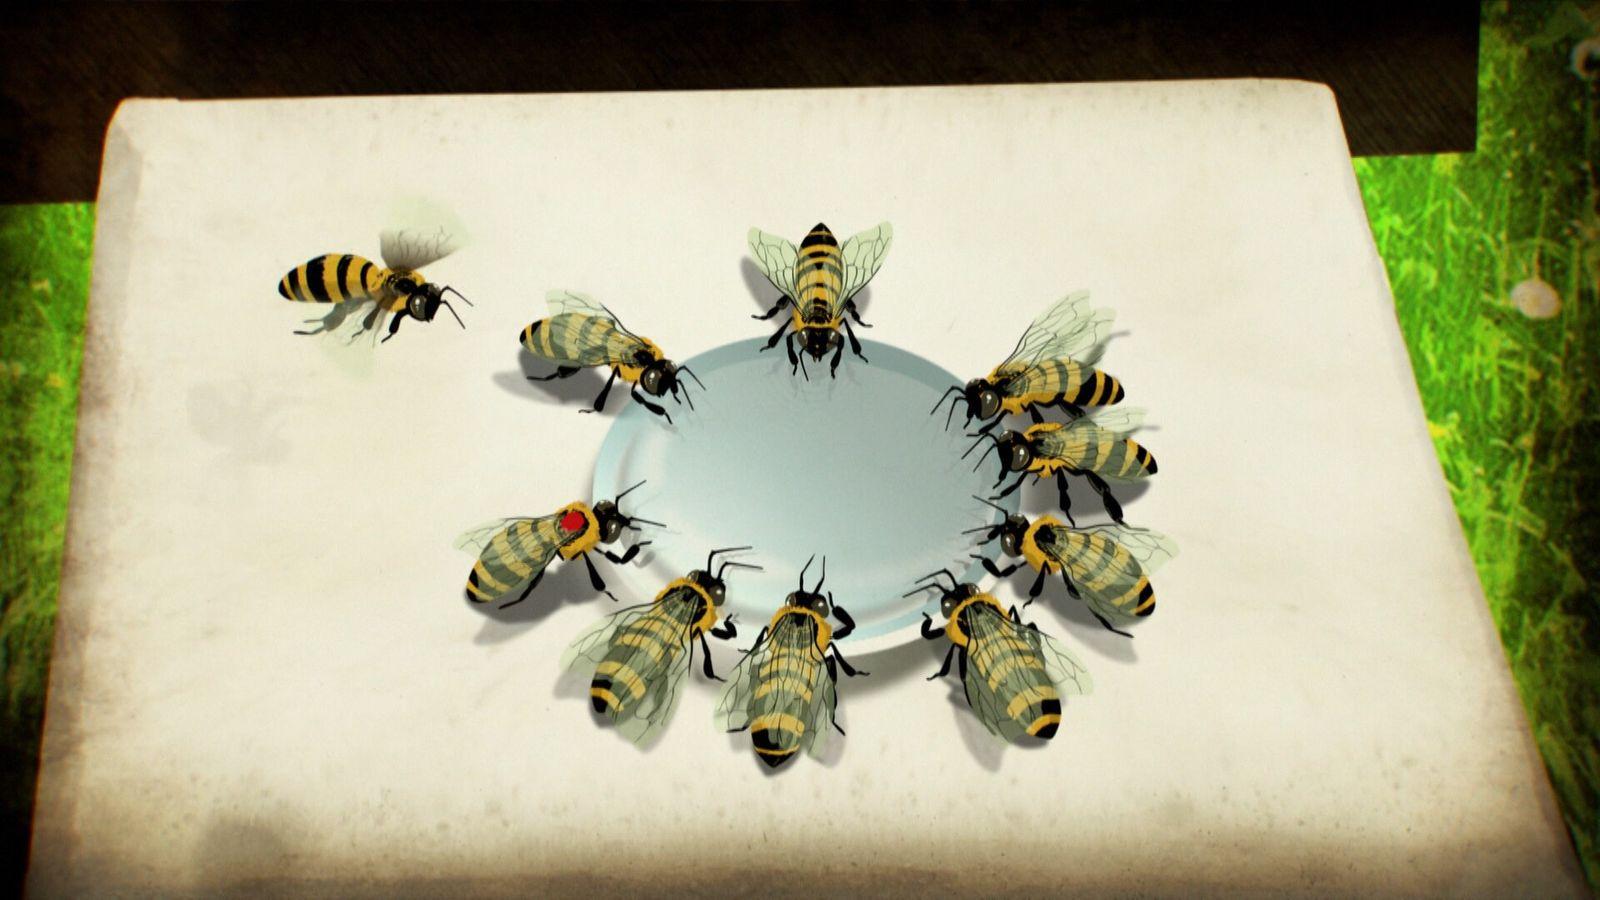 Bees talk